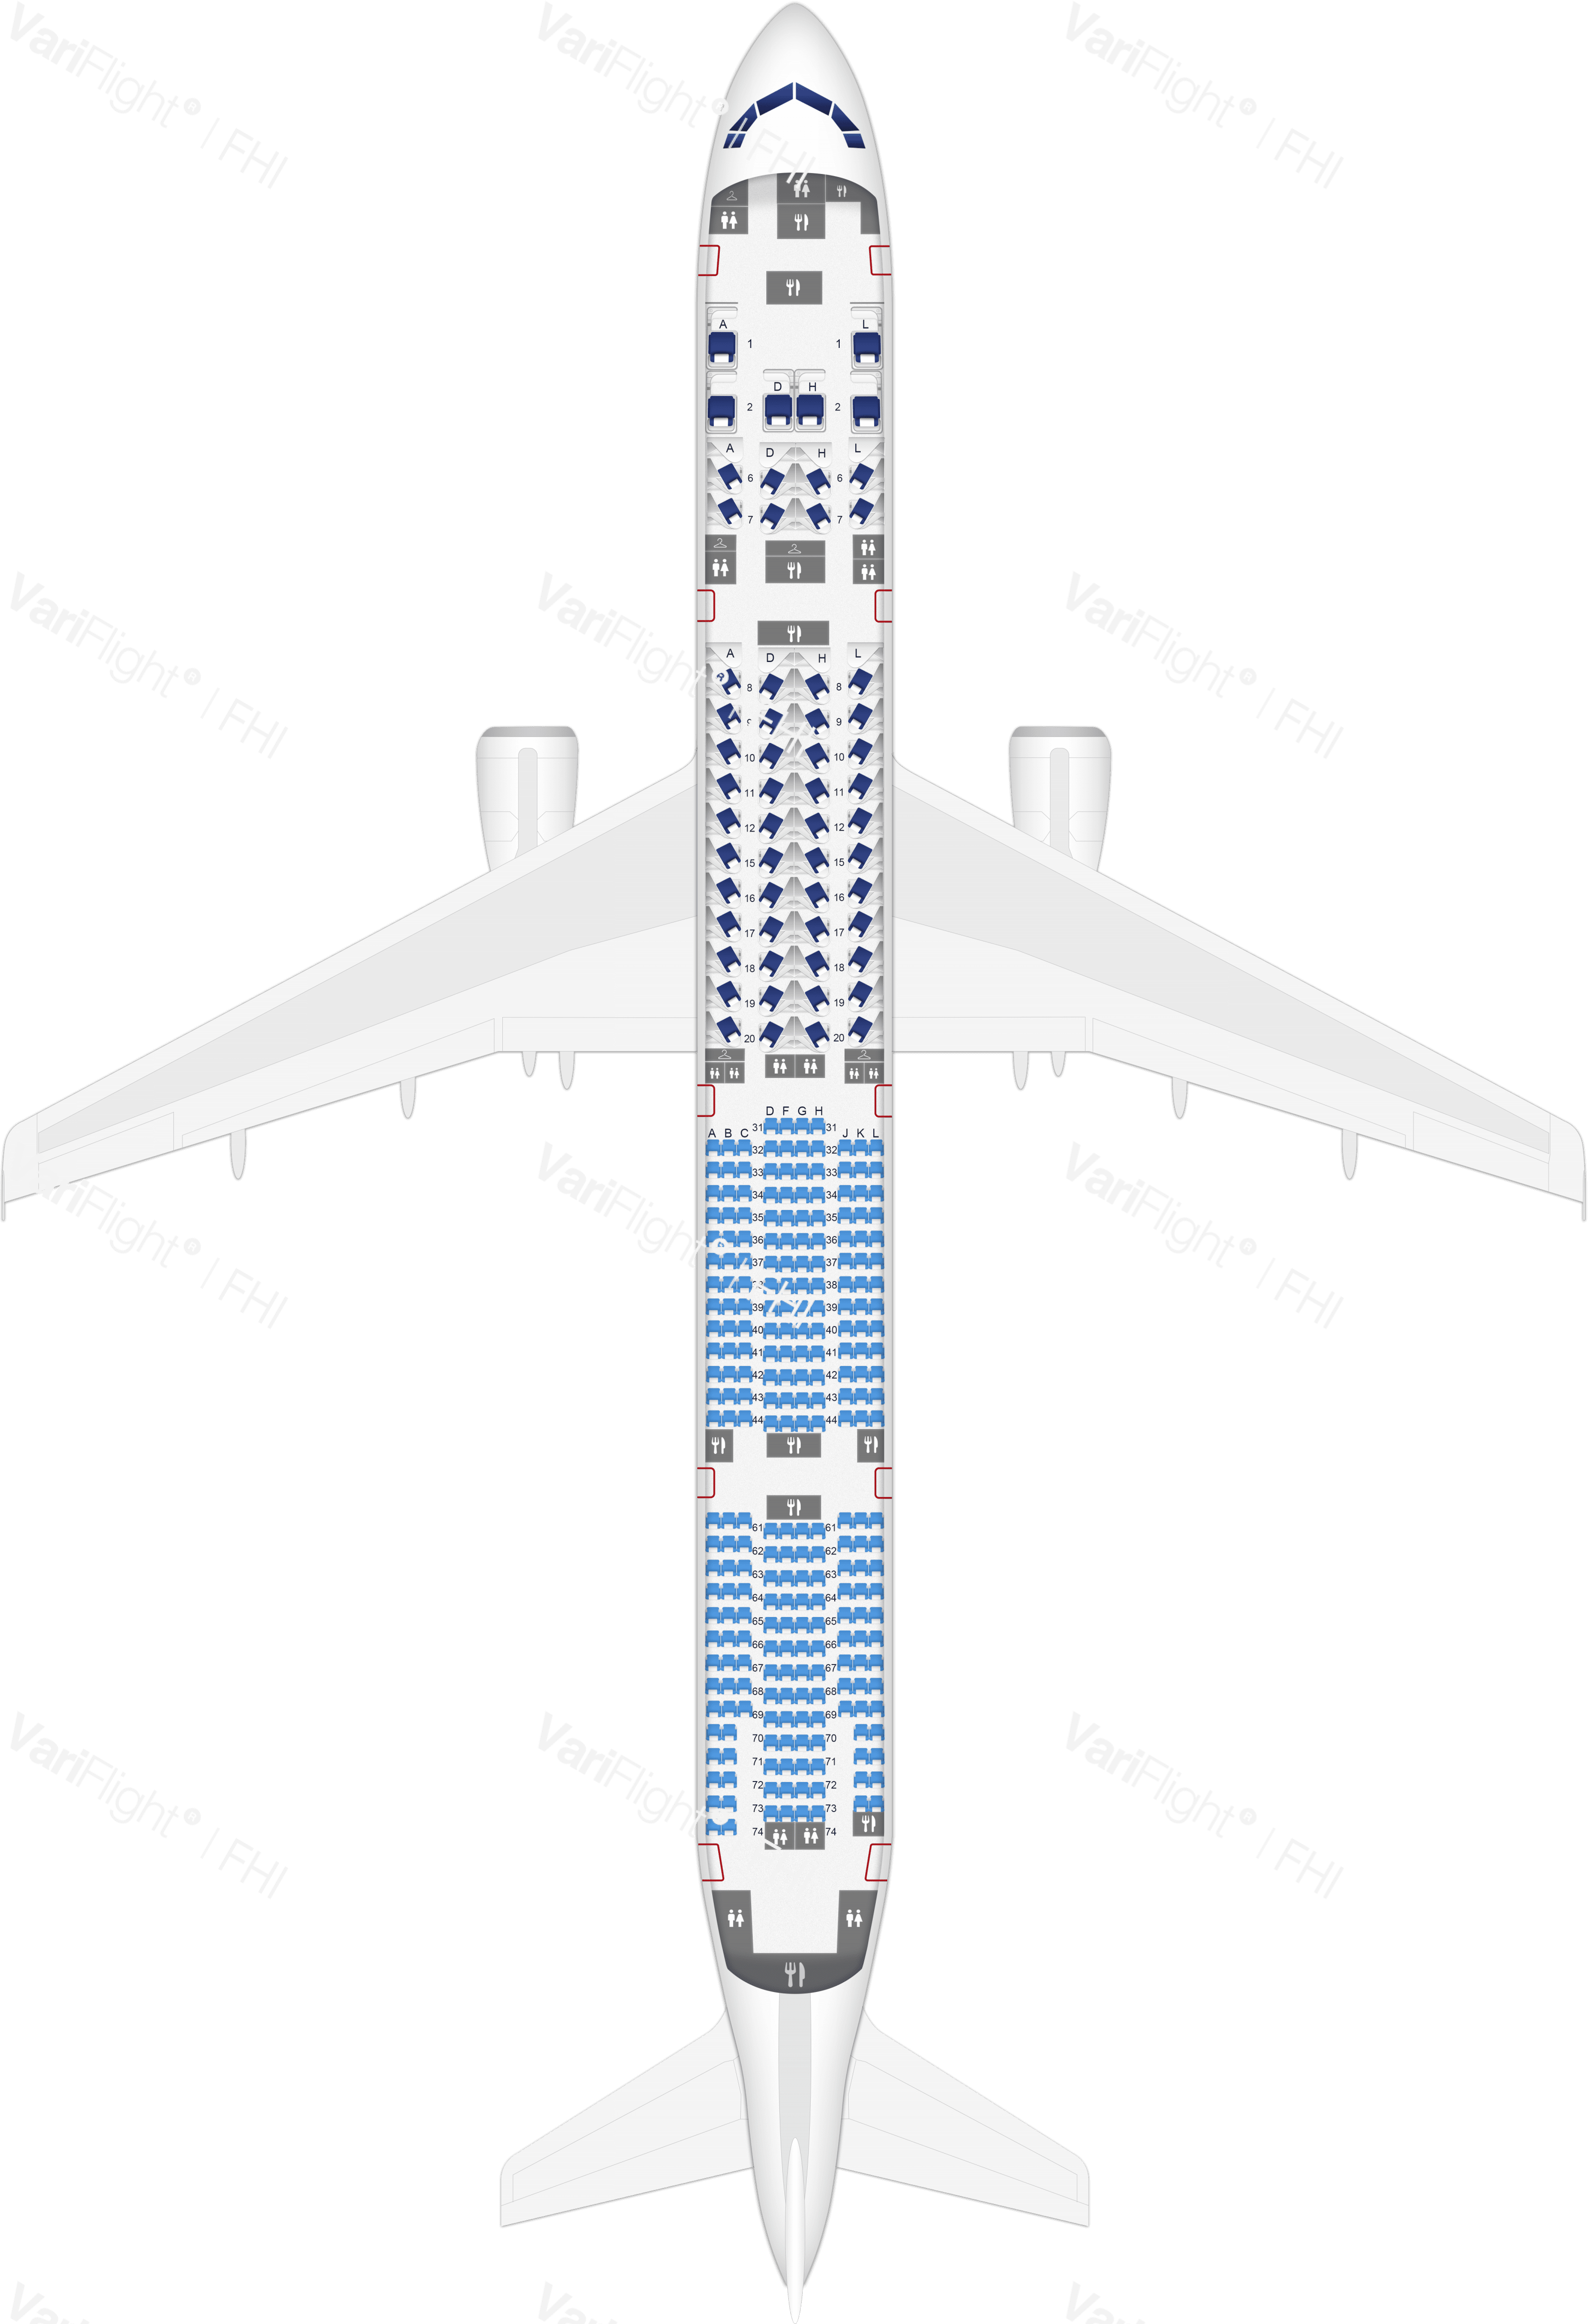 MU5103 Flight happiness | MU5103 Flight comfort